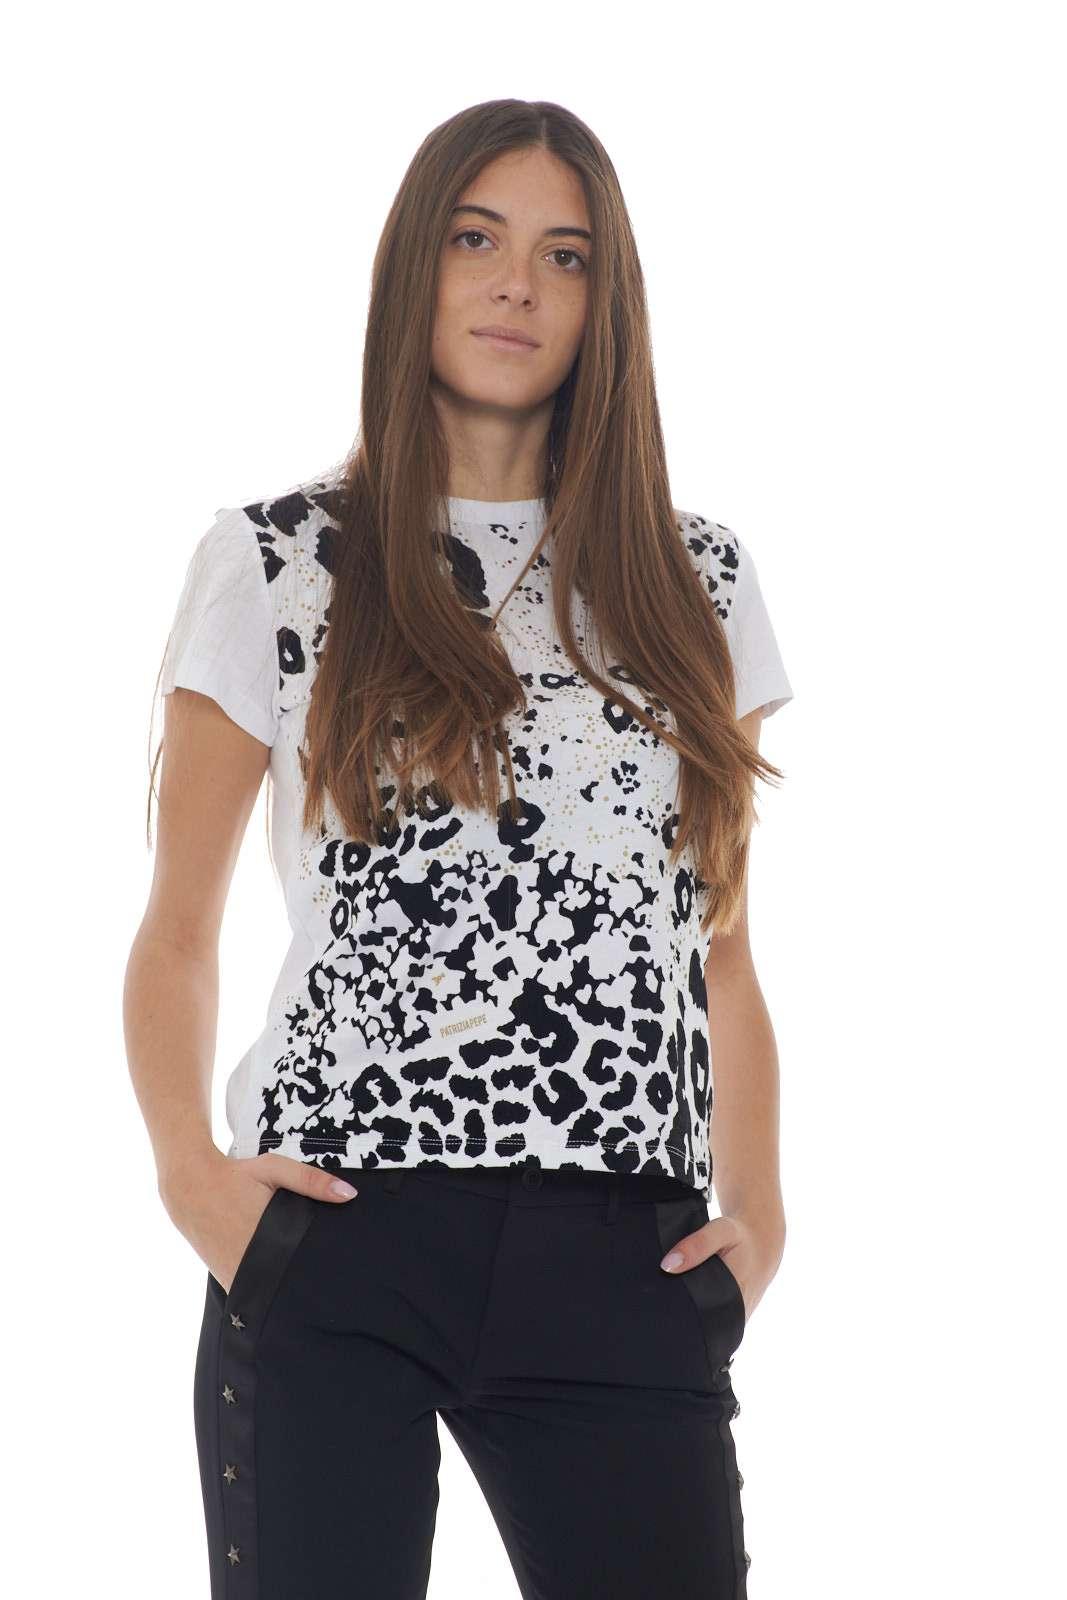 https://www.parmax.com/media/catalog/product/a/i/AI-outlet_parmax-t-shirt-donna-Patrizia-Pepe-2M3819-A.jpg